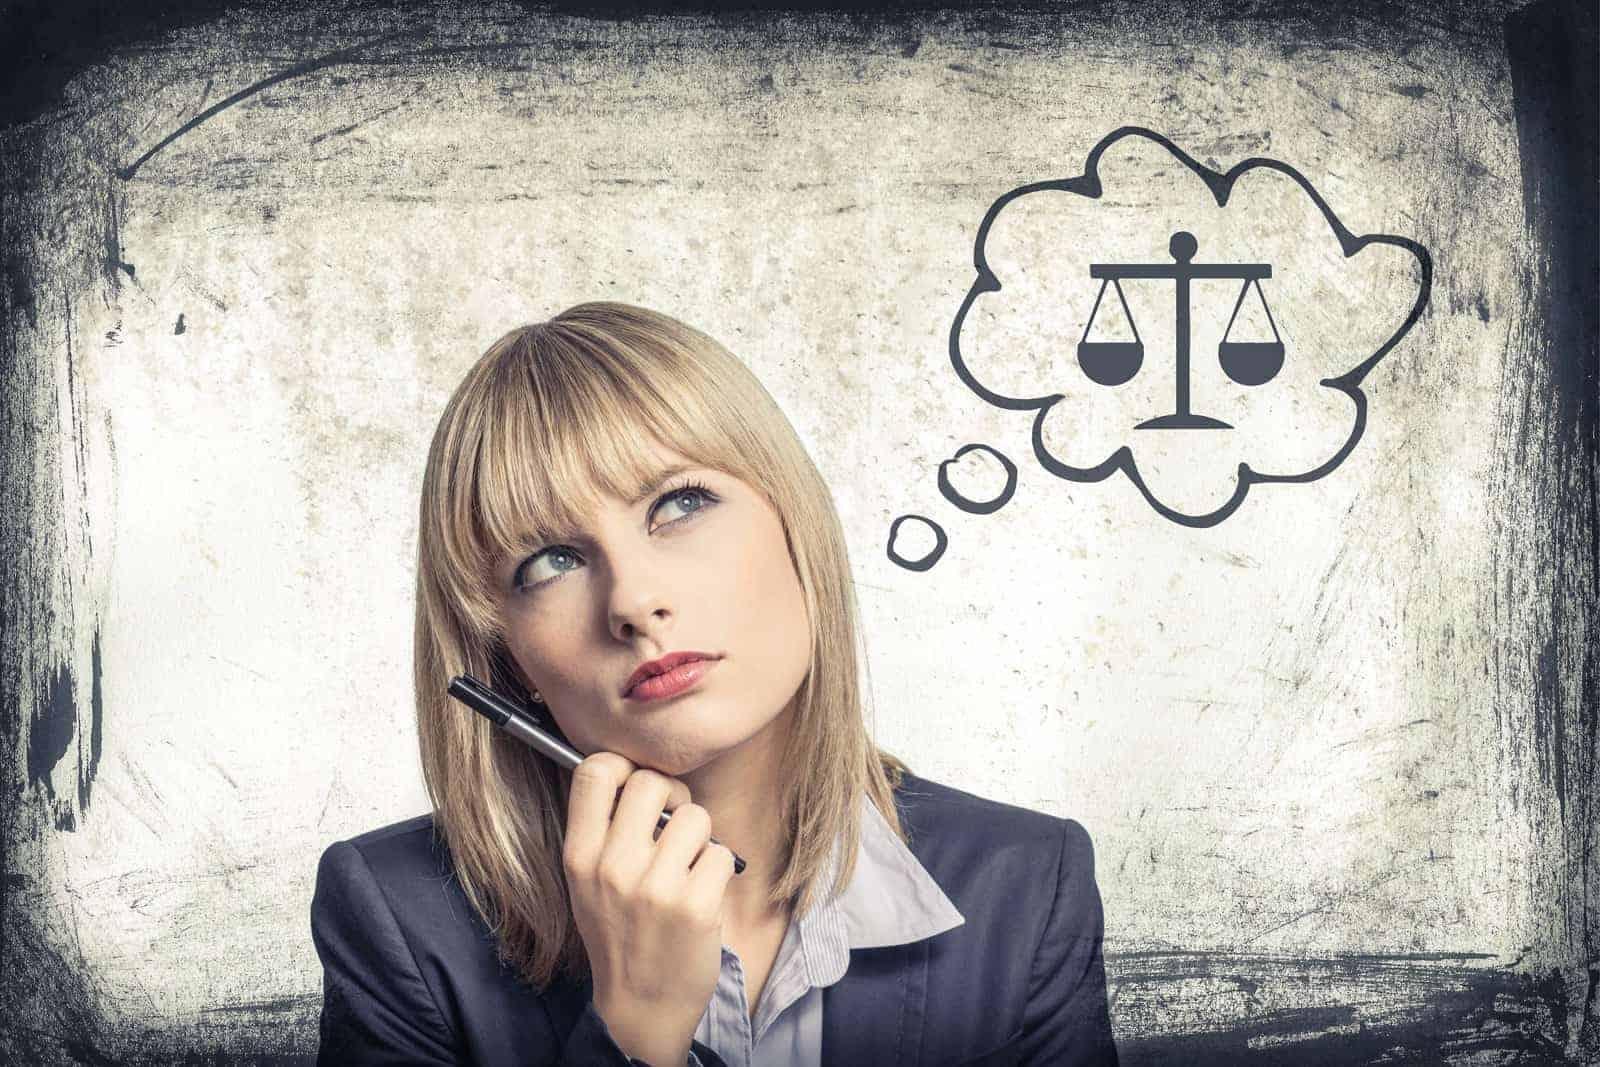 Rechtsschutzversicherung Leistungen